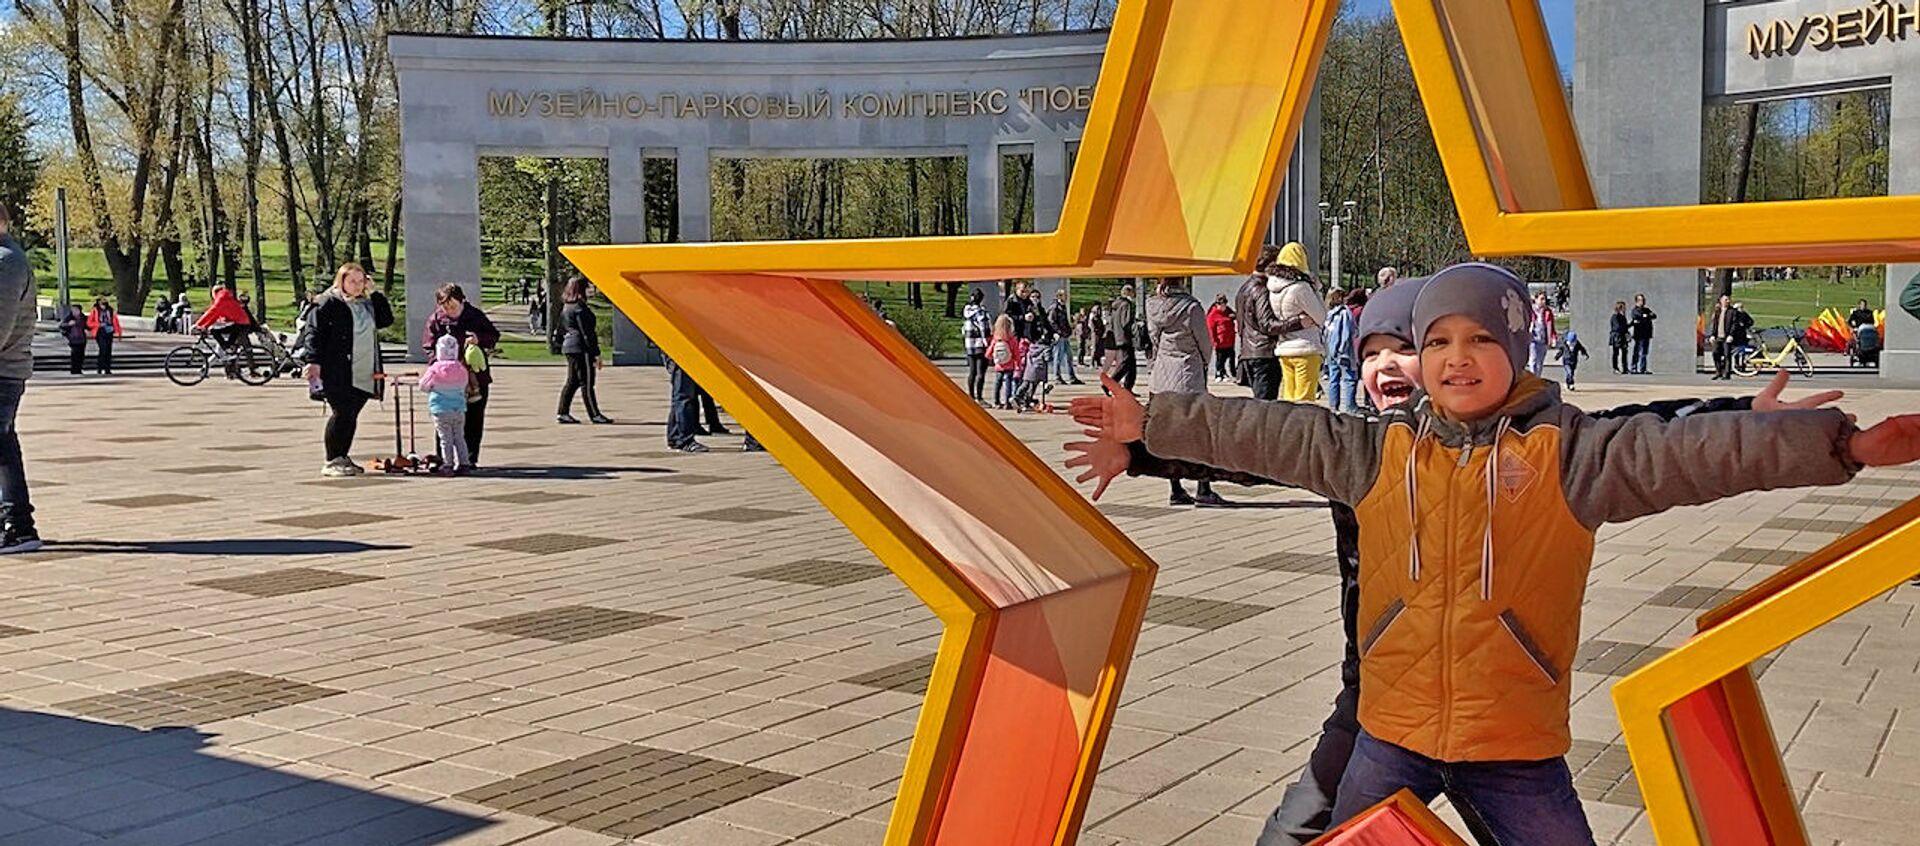 Дзень Перамогі - 2021 у Мінску - відэа - Sputnik Беларусь, 1920, 09.05.2021